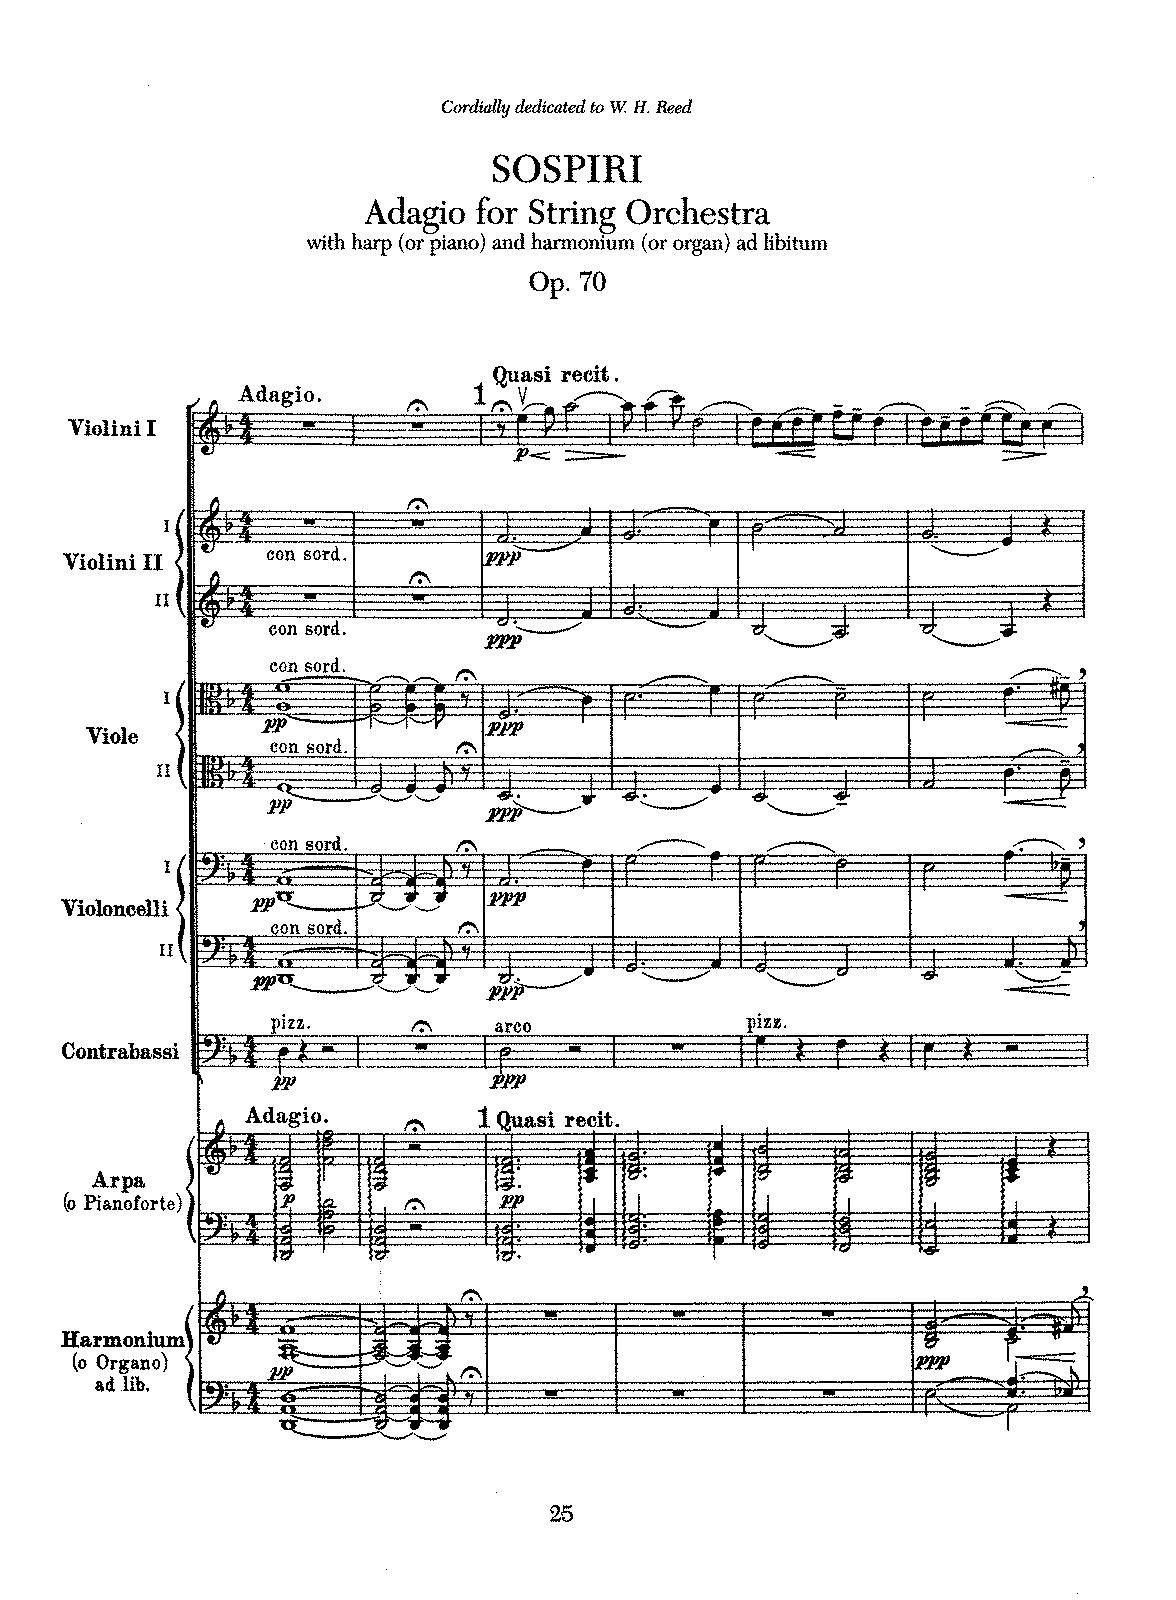 Sospiri, Op 70 (Elgar, Edward) - IMSLP/Petrucci Music Library: Free